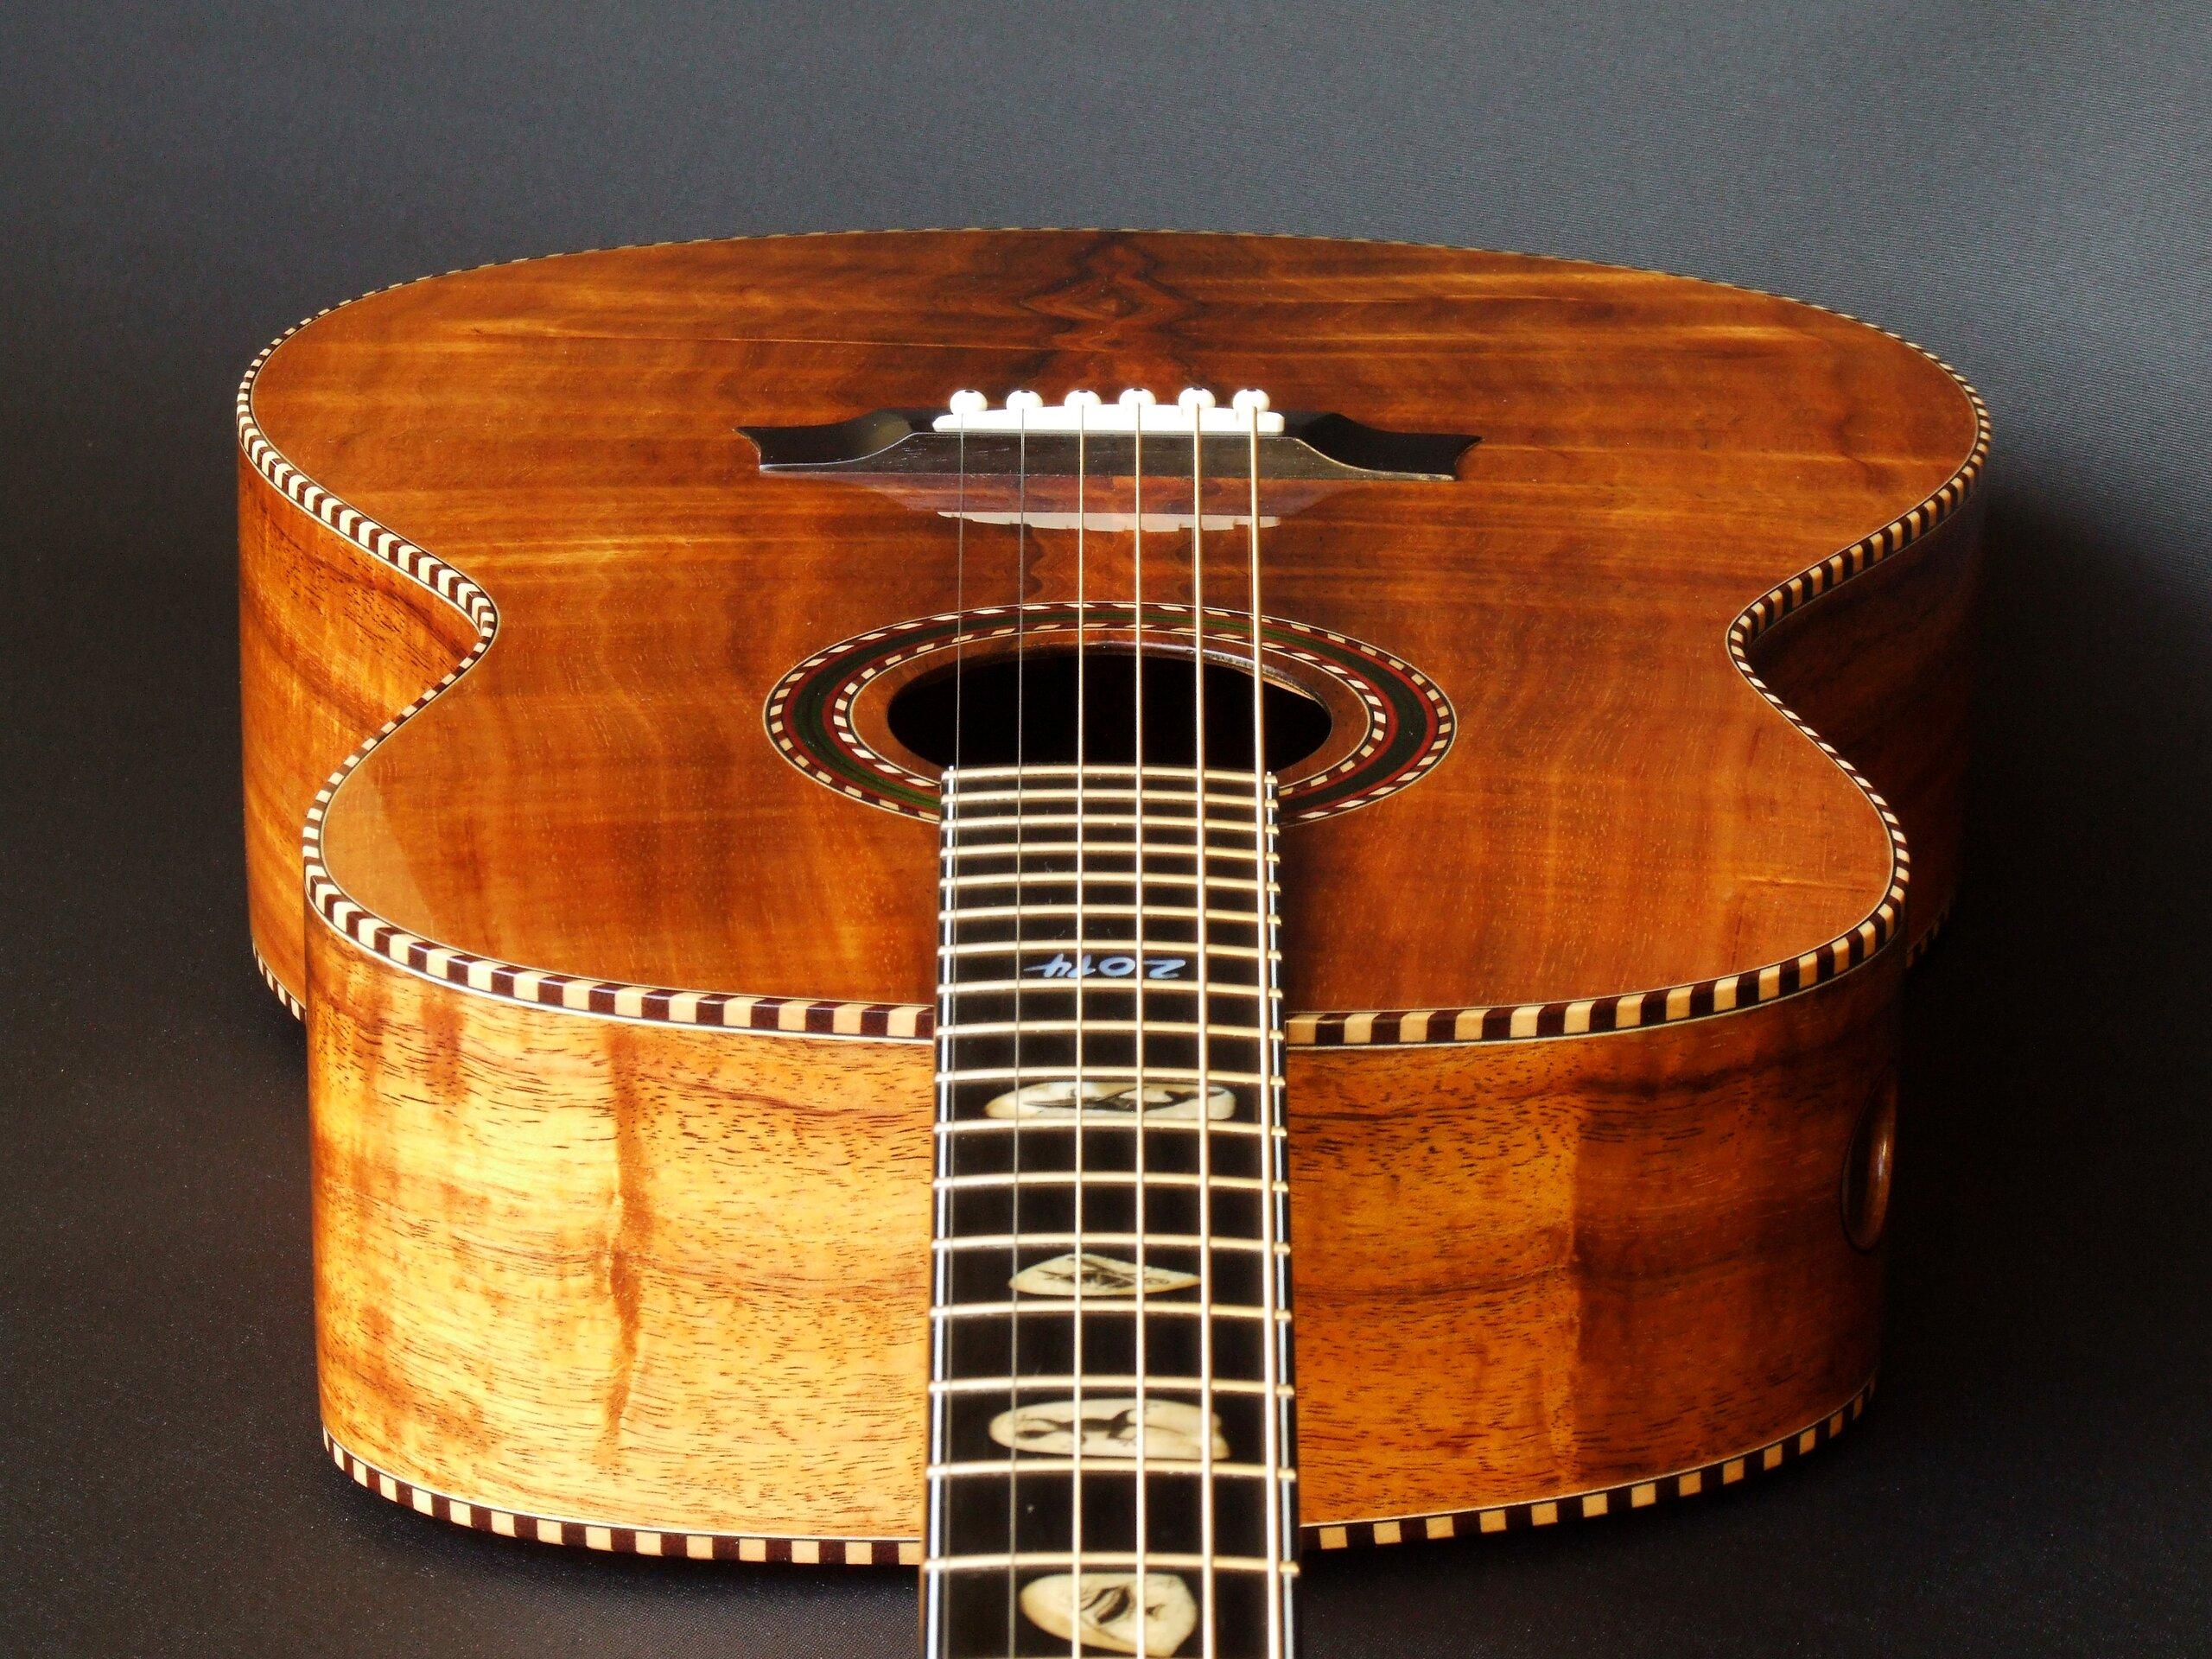 Wedge-shaped body on a figured koa guitar by Trevor Gore